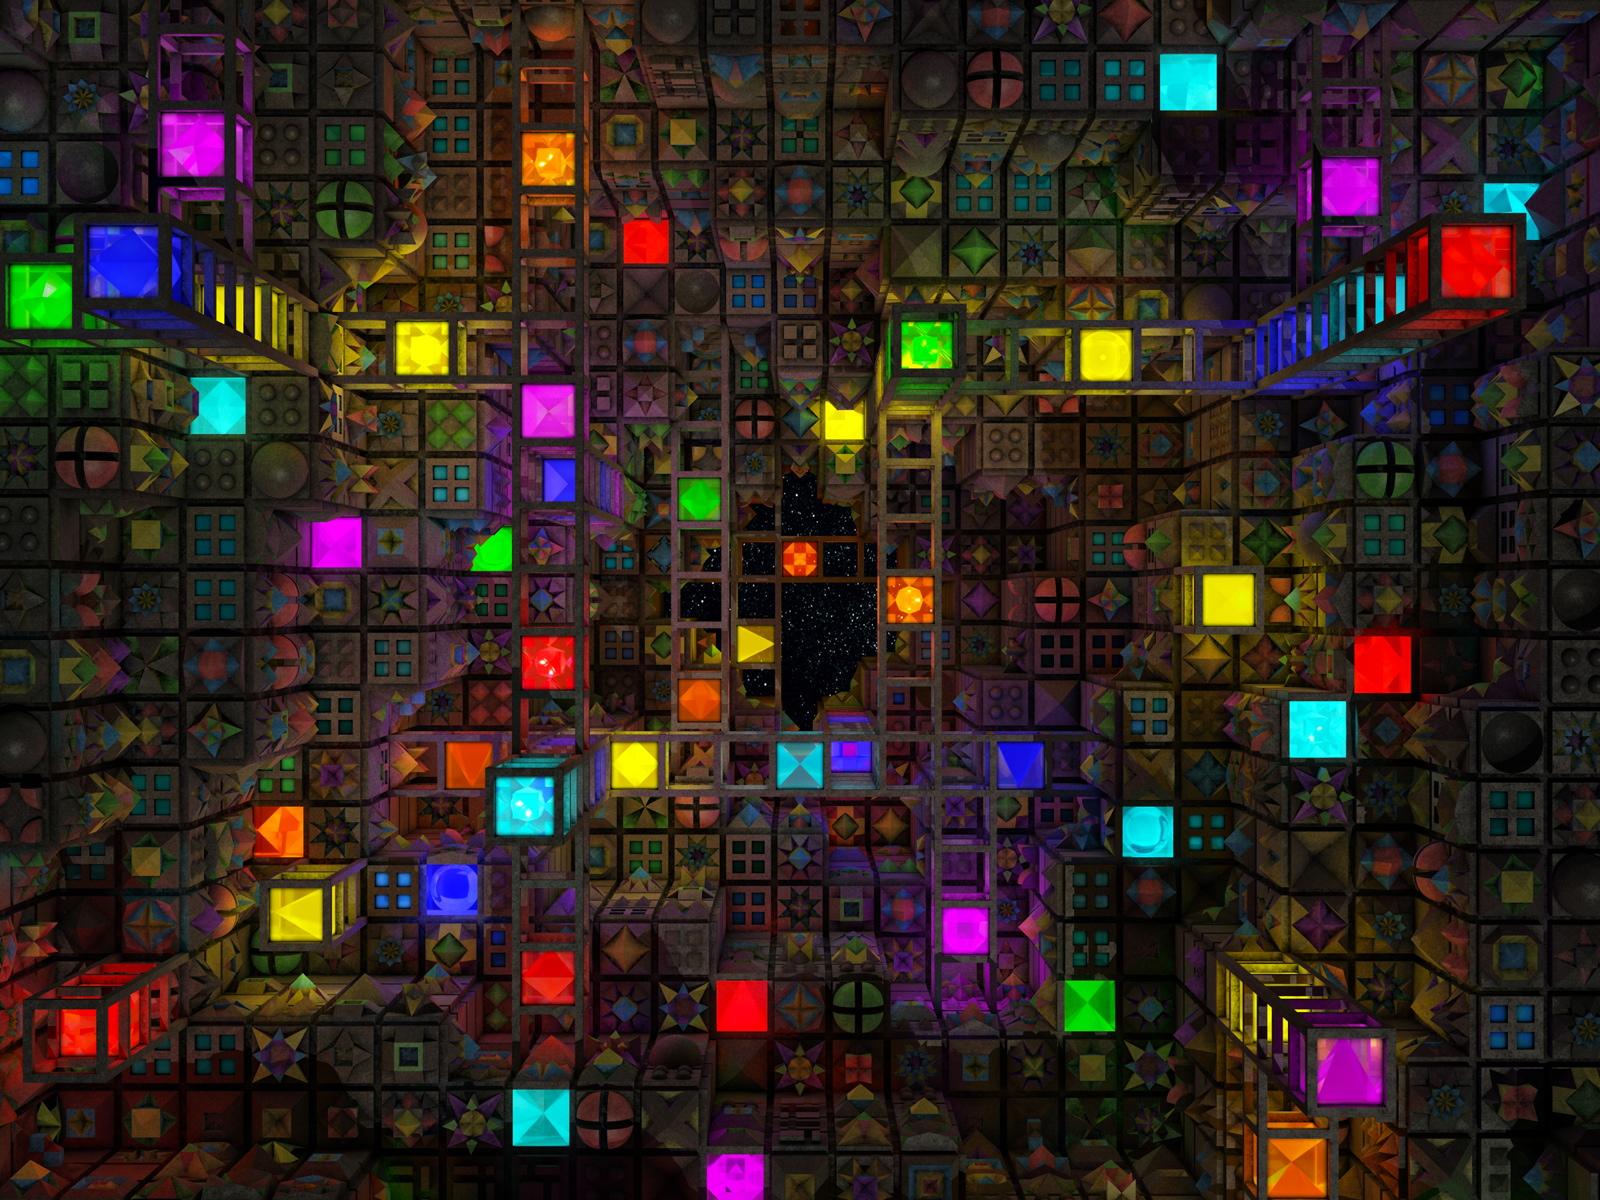 48 Colorful Hd Abstract Wallpapers On Wallpapersafari